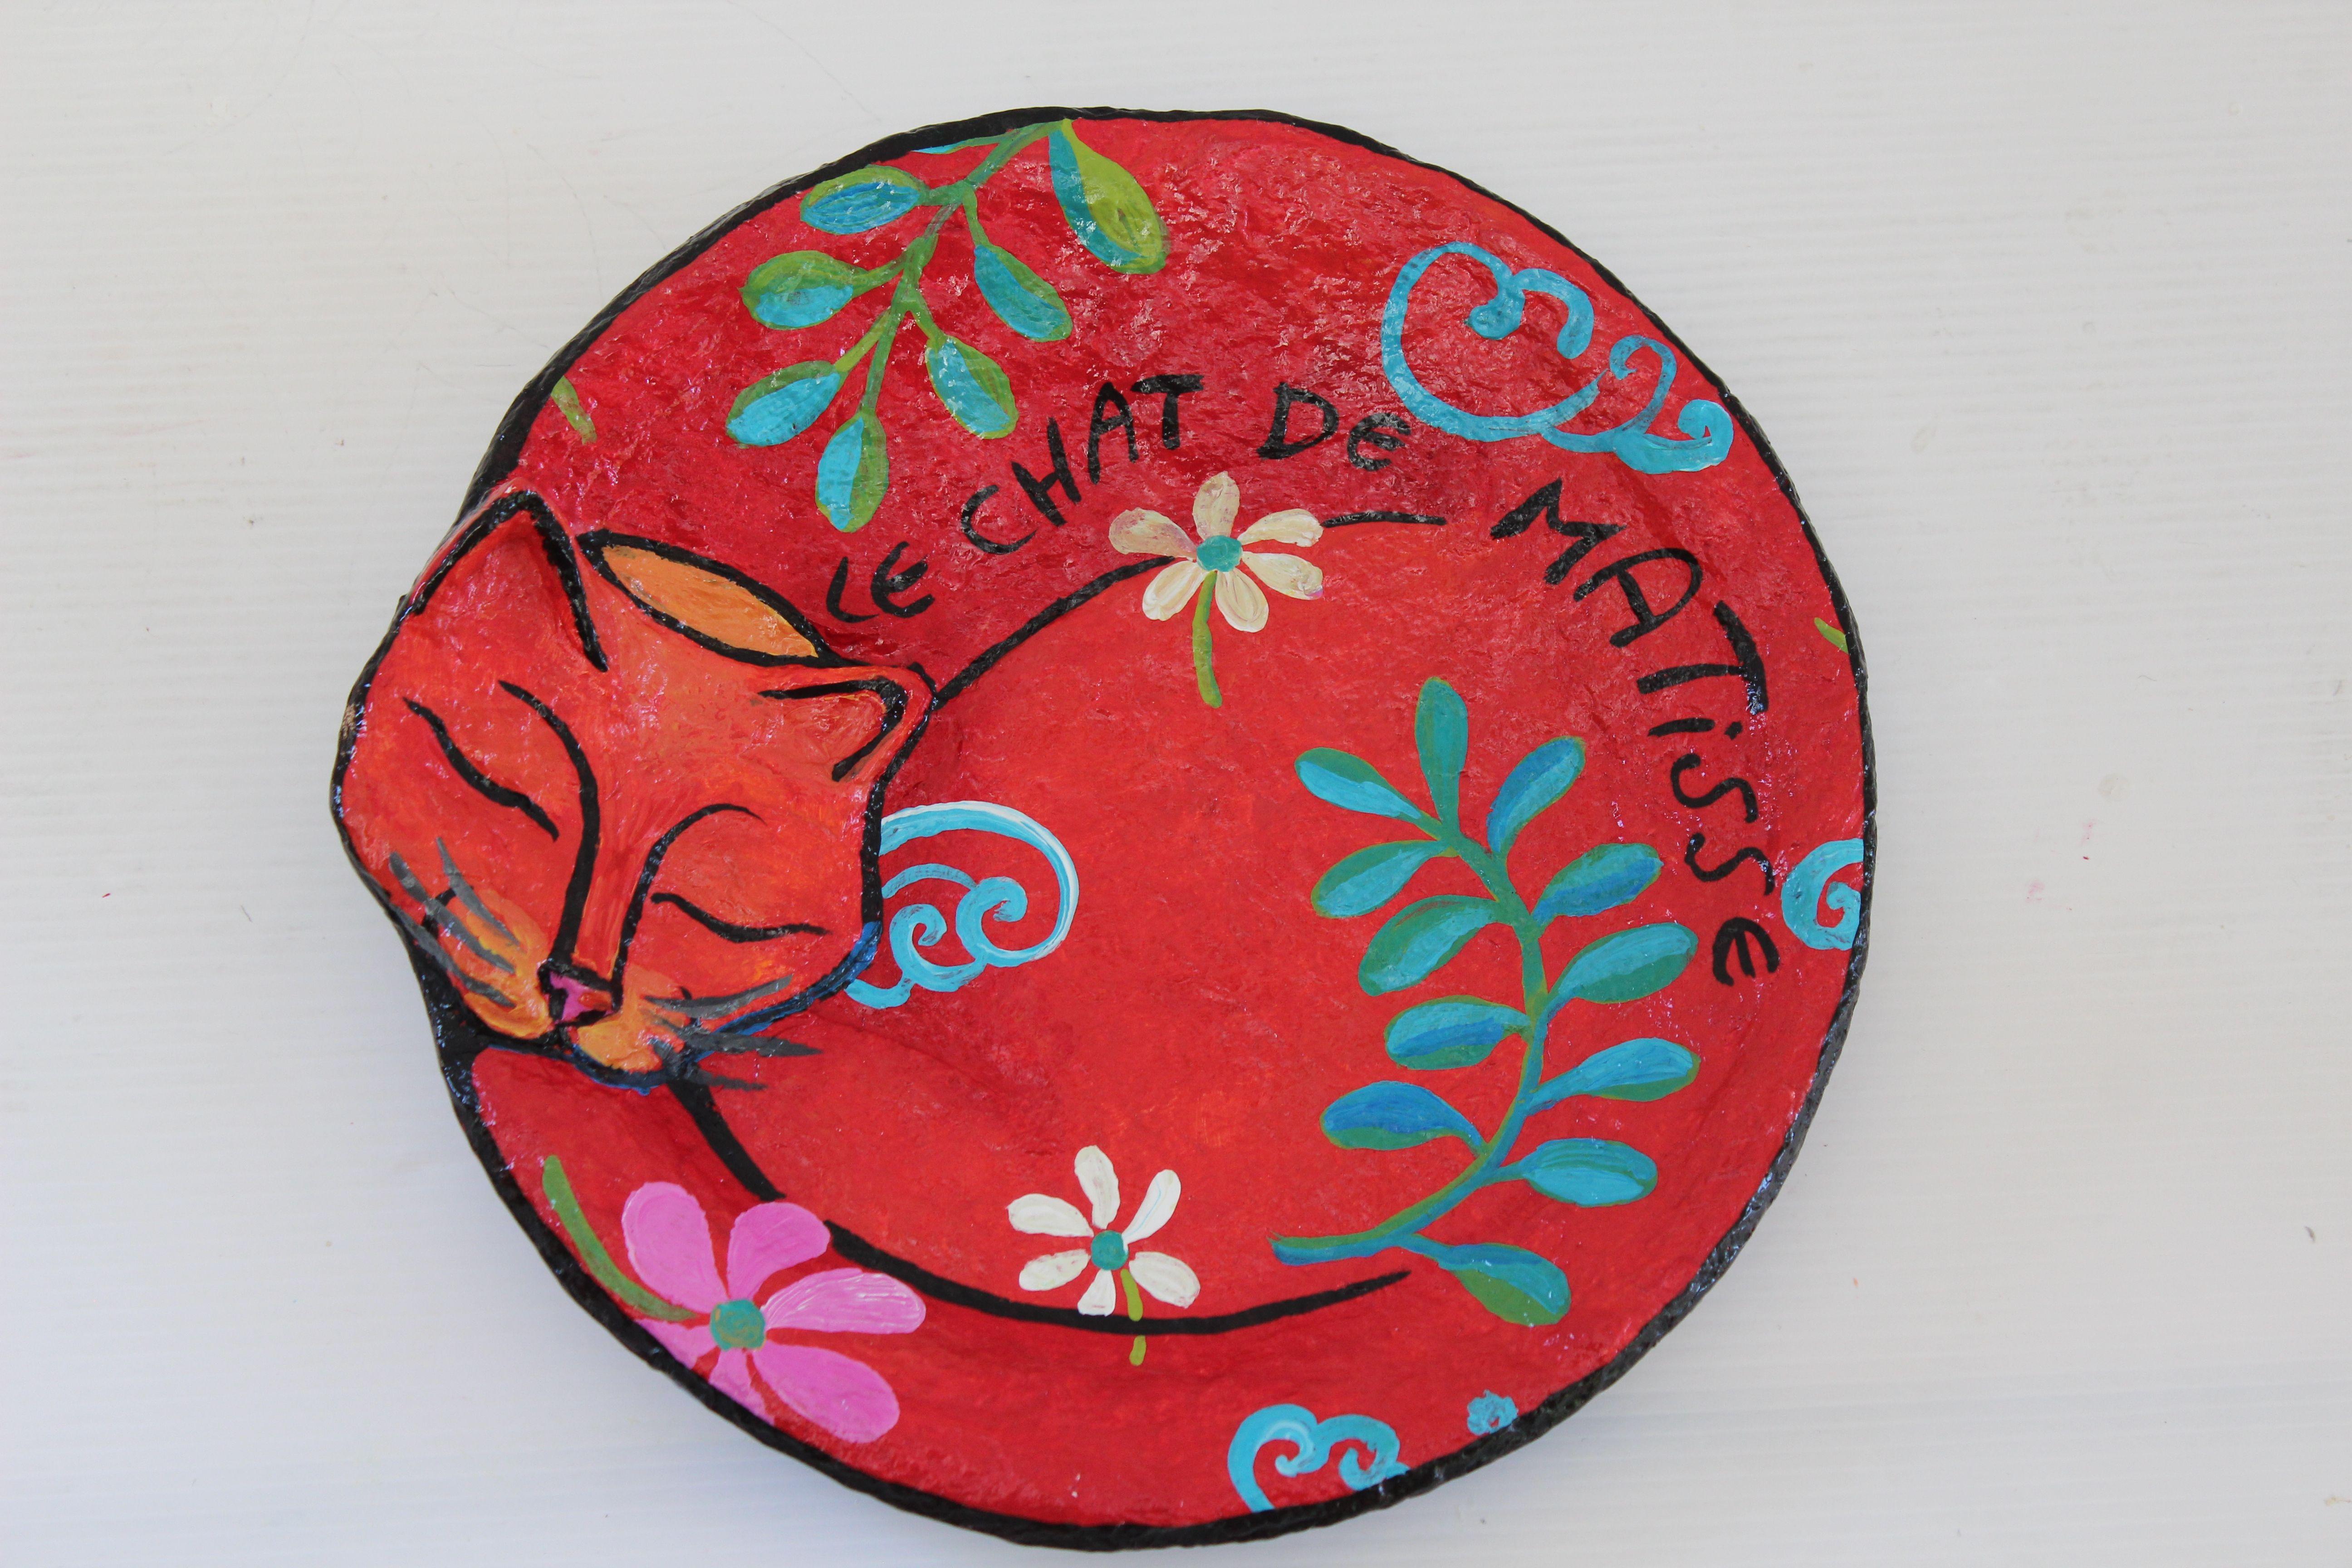 Paper mache plate u0027hand painted plate-Le chat de Matisse by Liat Binyamini Ariel & Paper mache plate u0027hand painted plate-Le chat de Matisse by Liat ...